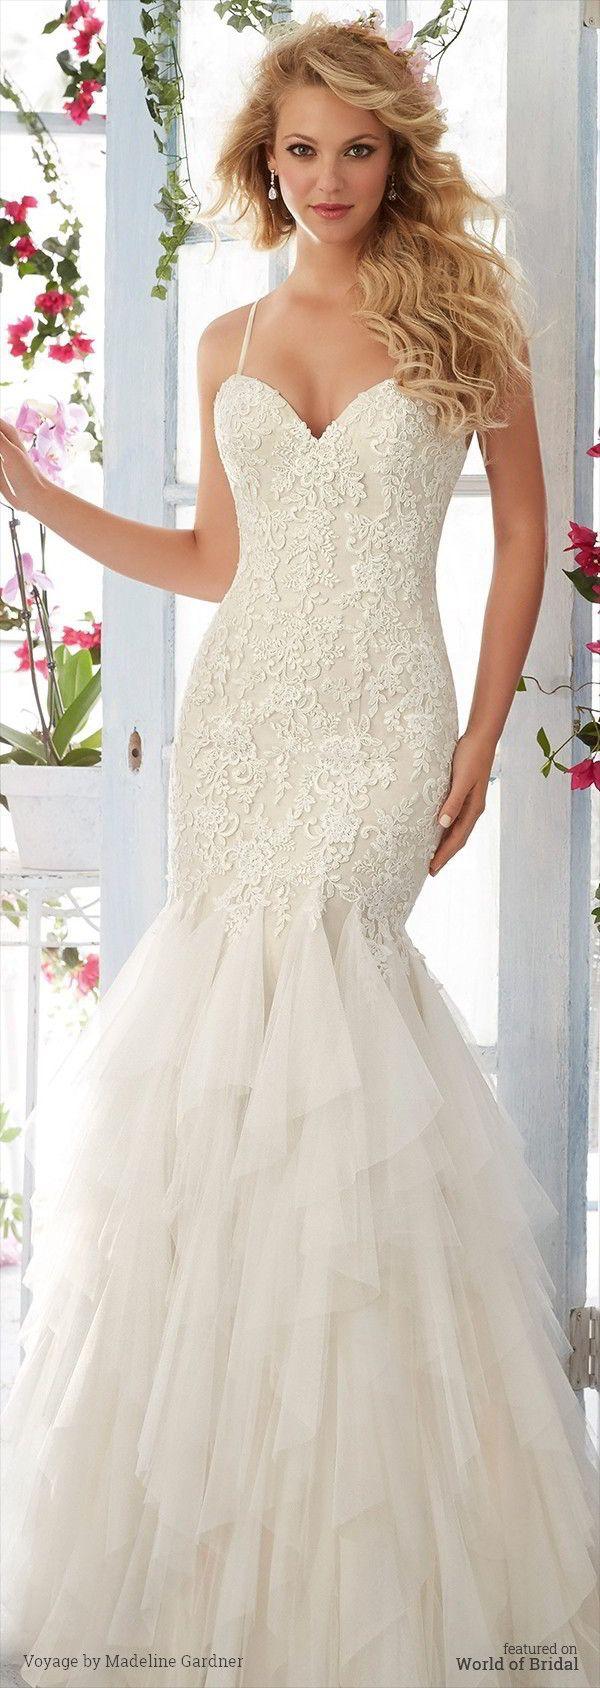 716926b566097aaddd9fd072ea41d449  spring wedding dresses spring weddings - Mori Lee Wedding Dresses